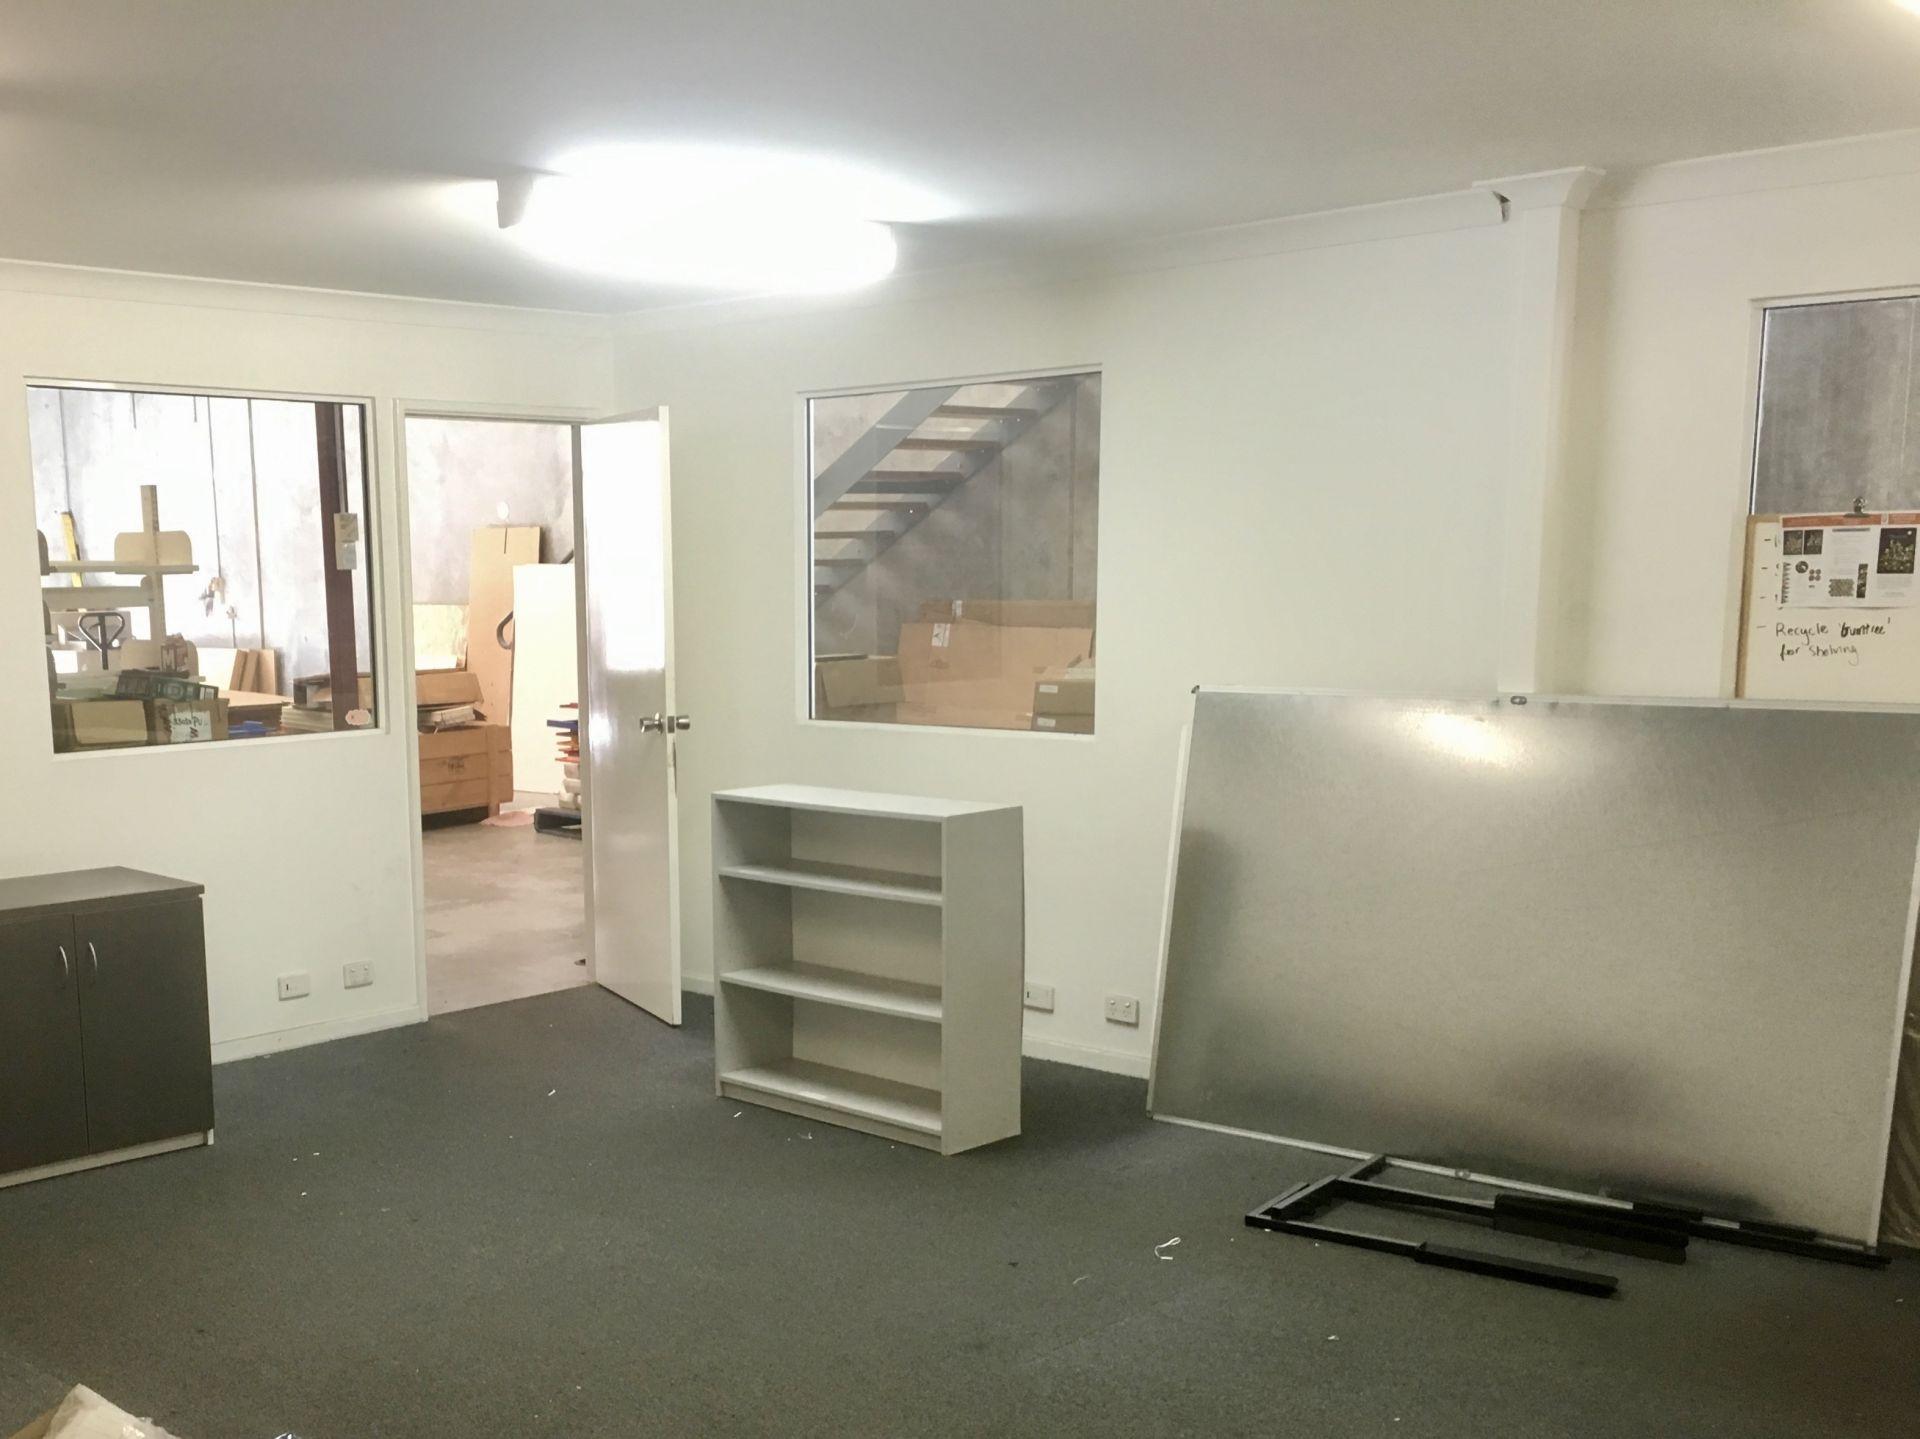 Office / showroom warehouse unit with mezzanine storage level - suit many uses